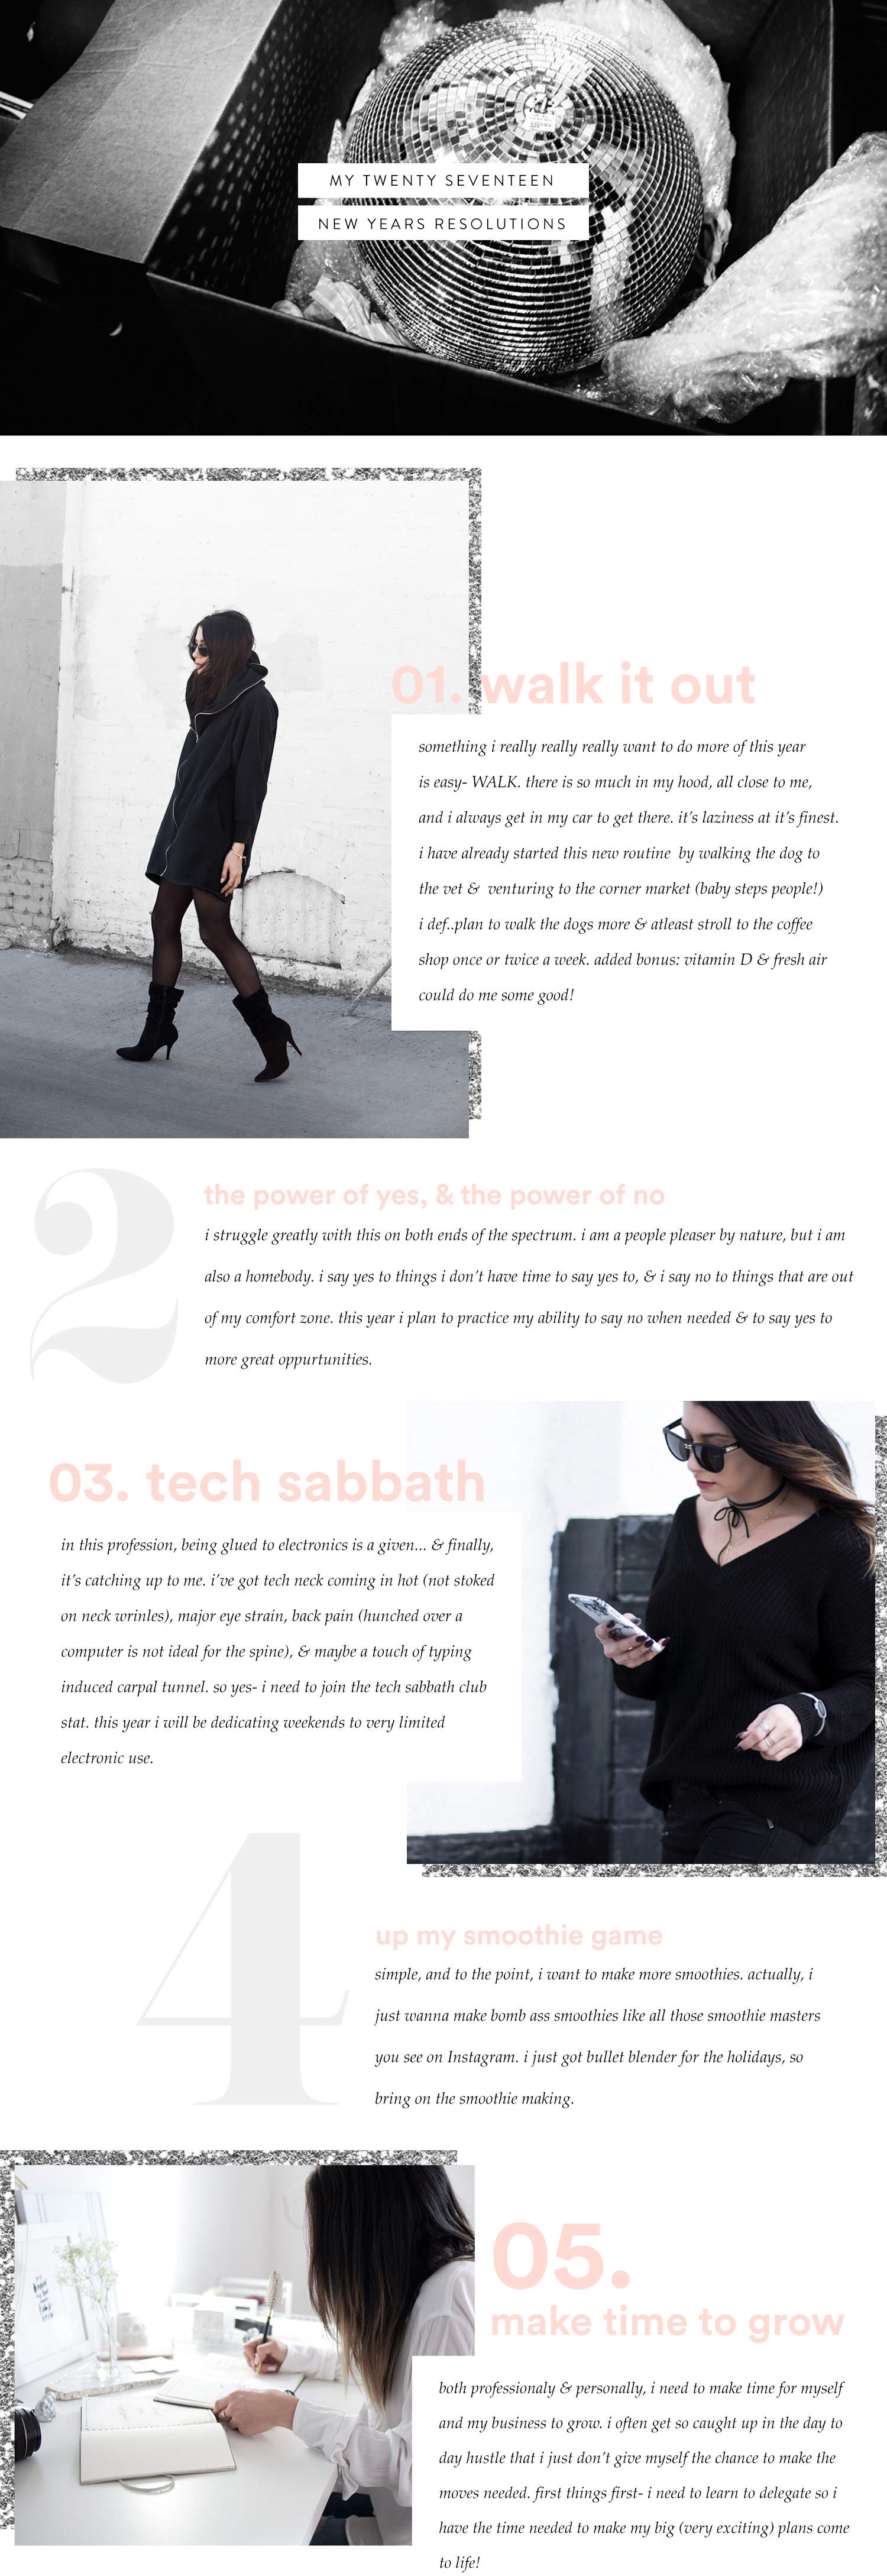 fashionlush, new years resolutions, 2017